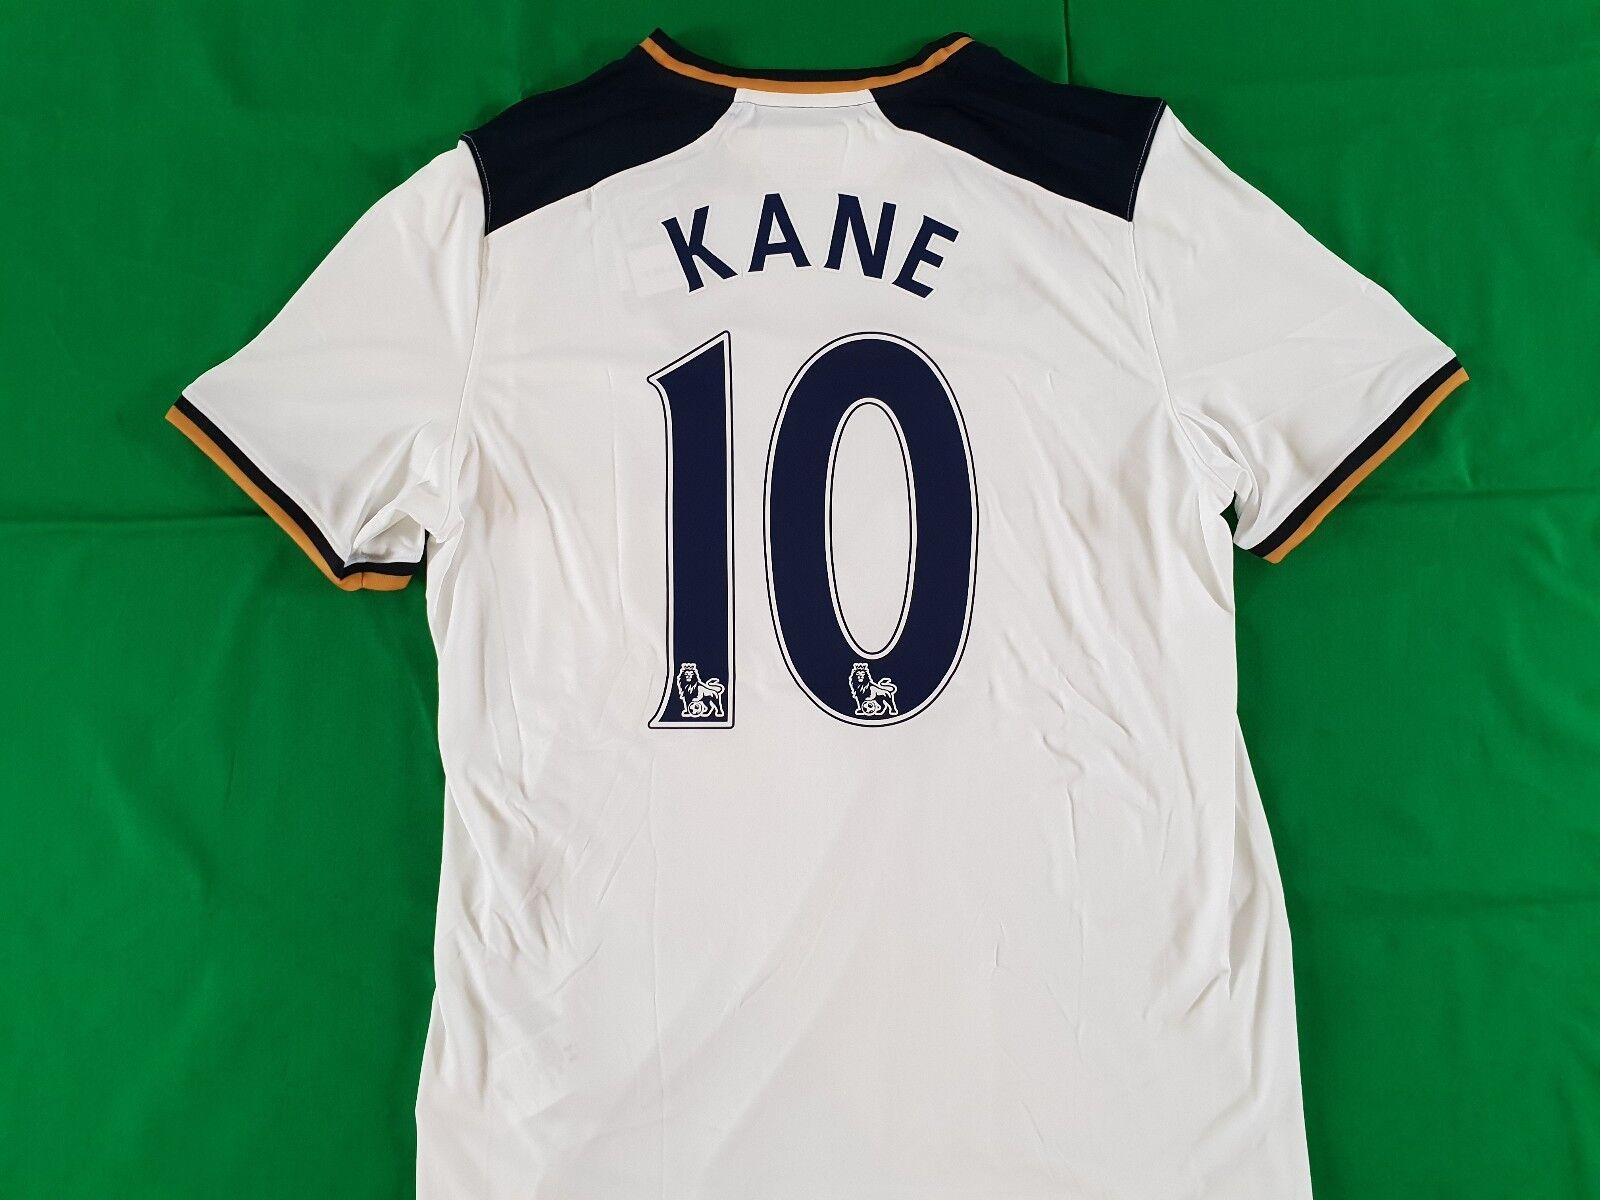 Tottenham Hotspurs Trikot Home 2016/17 Under Armour Größe L XL -NEU- 10 Kane